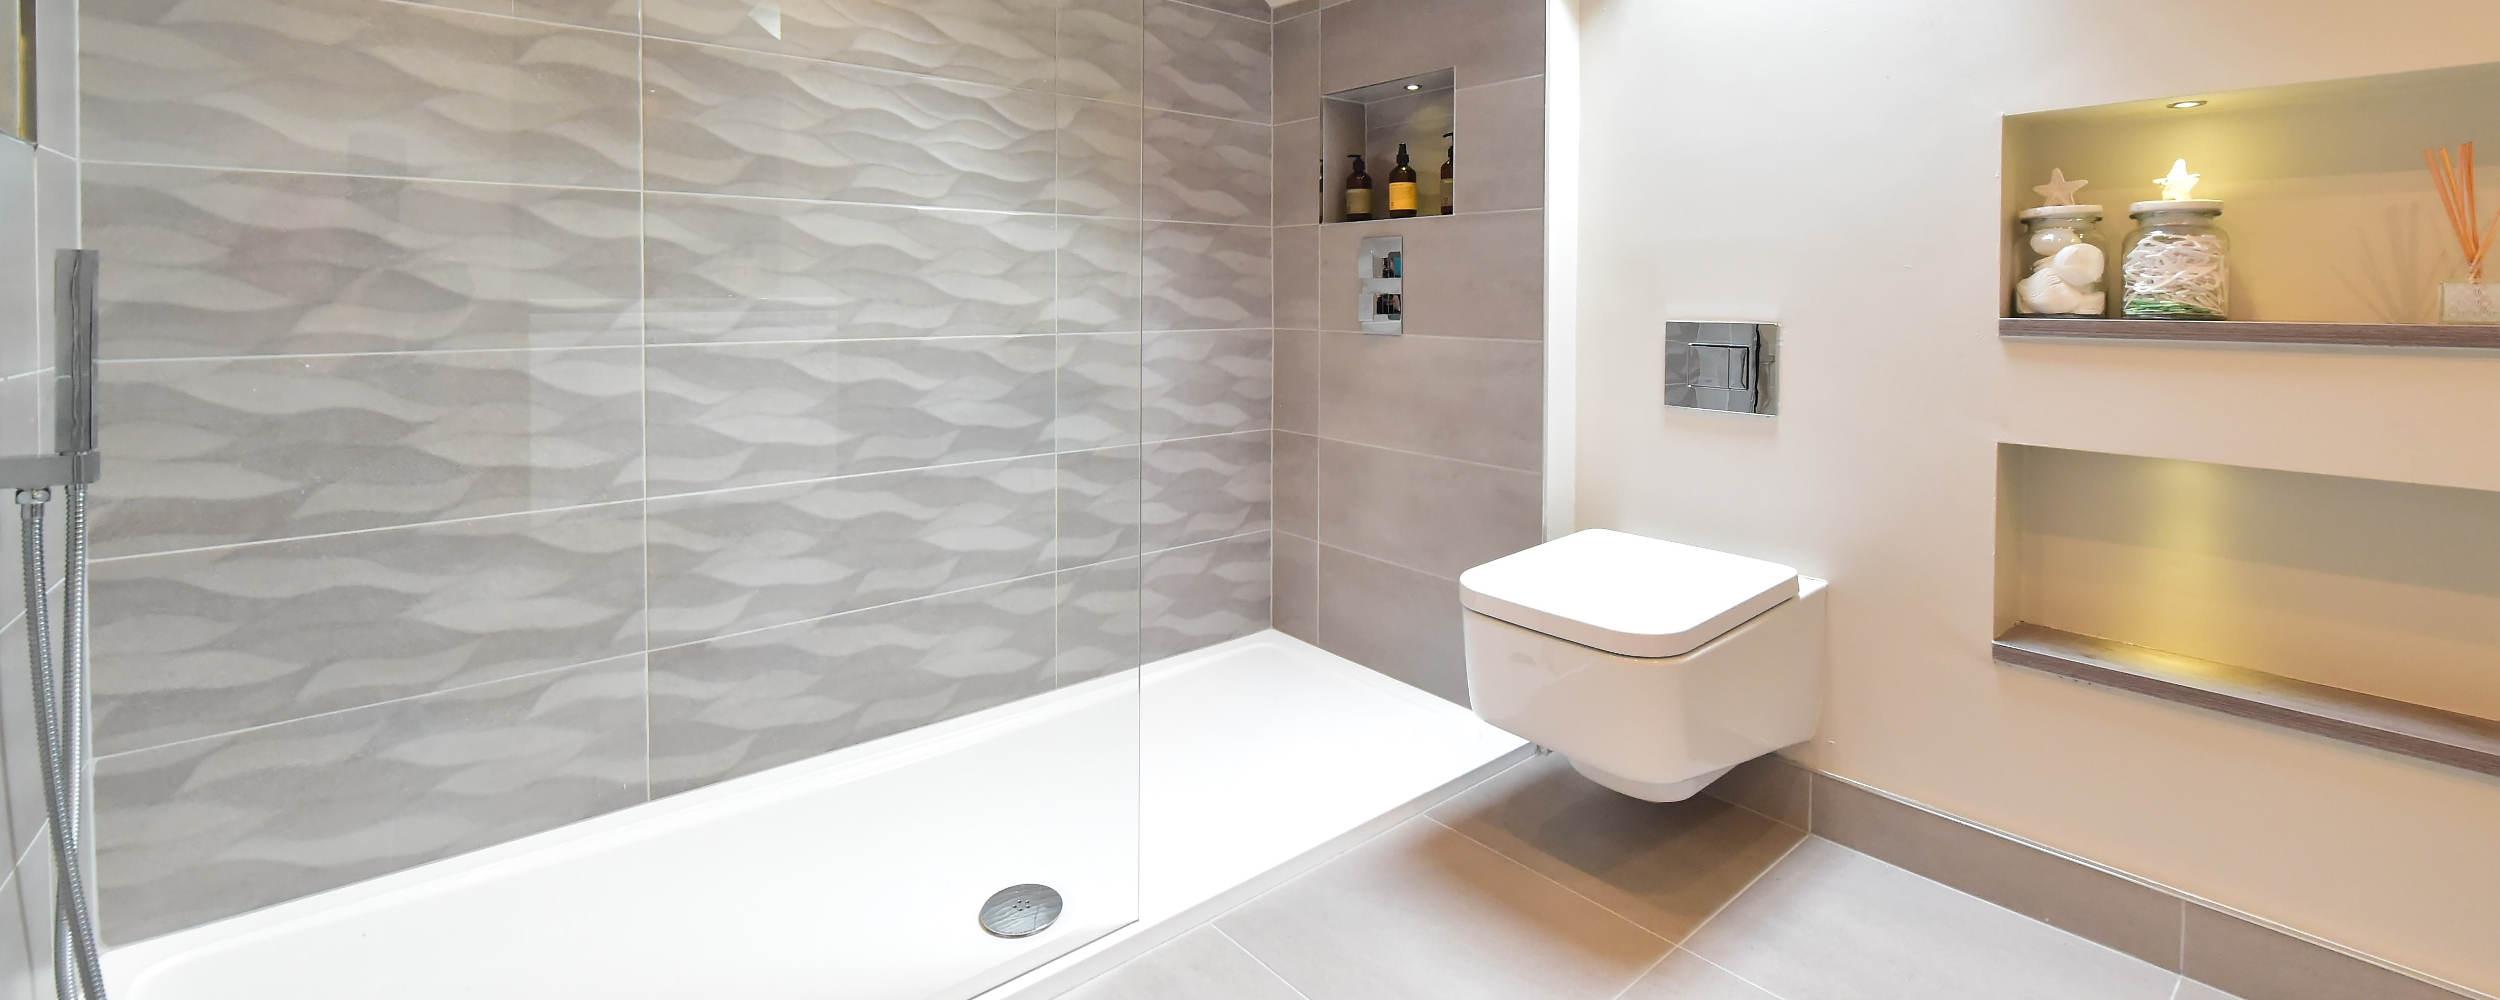 Bathroom Design Uk Fresh In Classic Modern Ideas Cheap Simple 5000 4880 Home Design Ideas